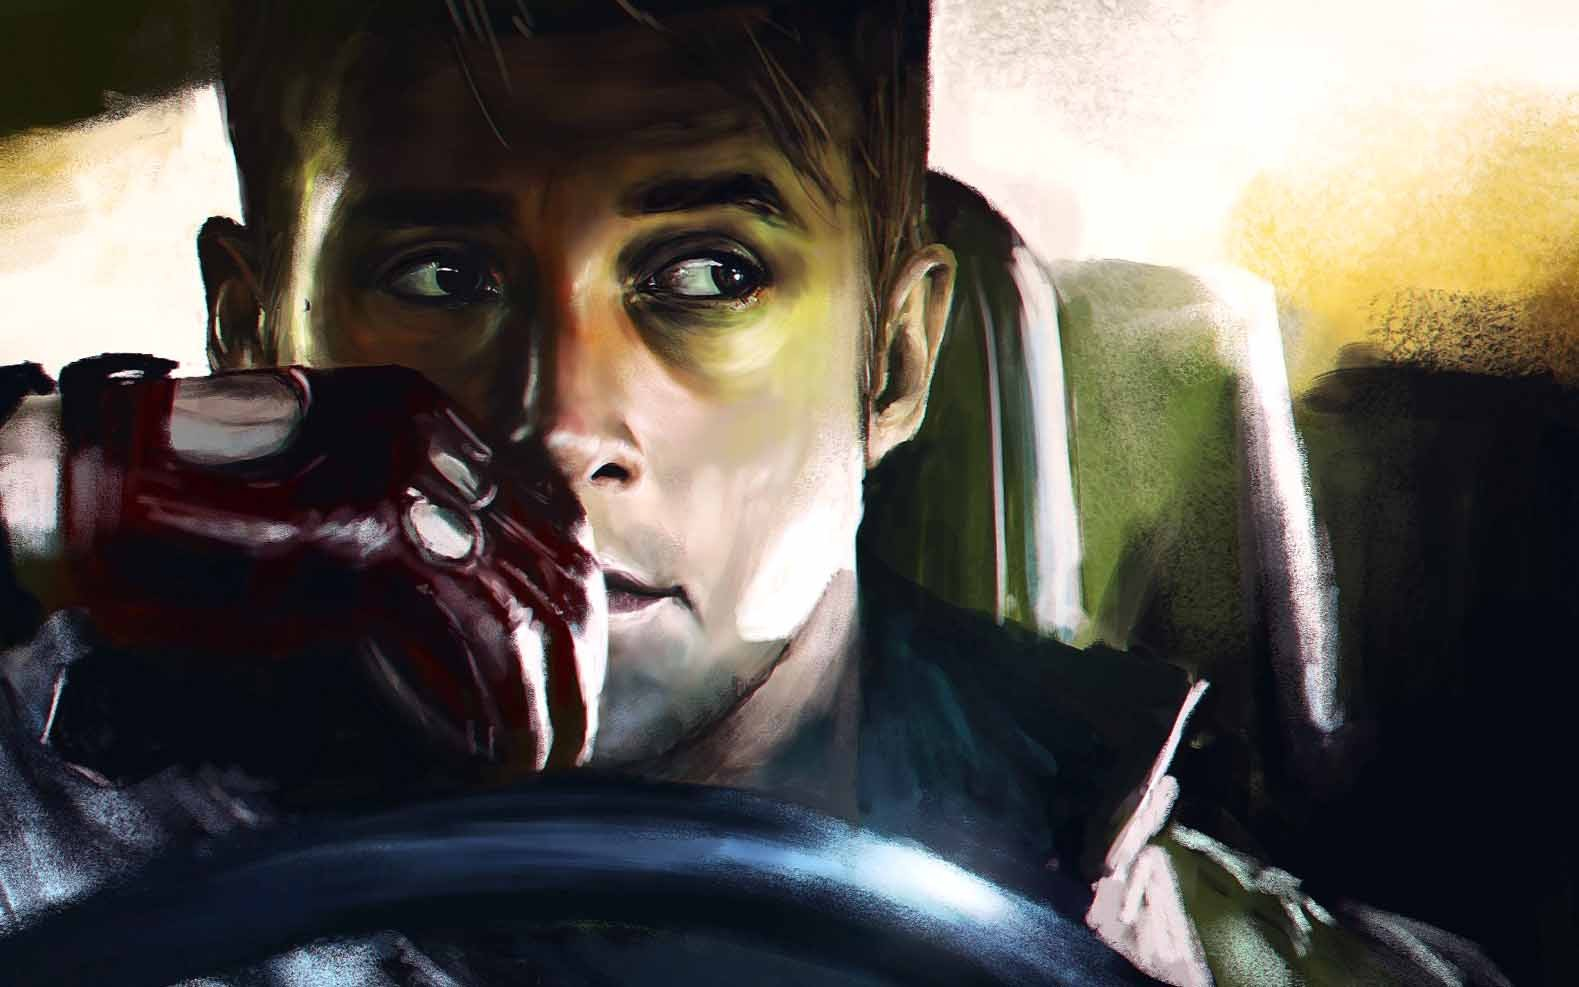 Rya, Goslingt, Men, Painting, Car, Illustraion, Art, - Hd Painting Pictures Of Men - HD Wallpaper